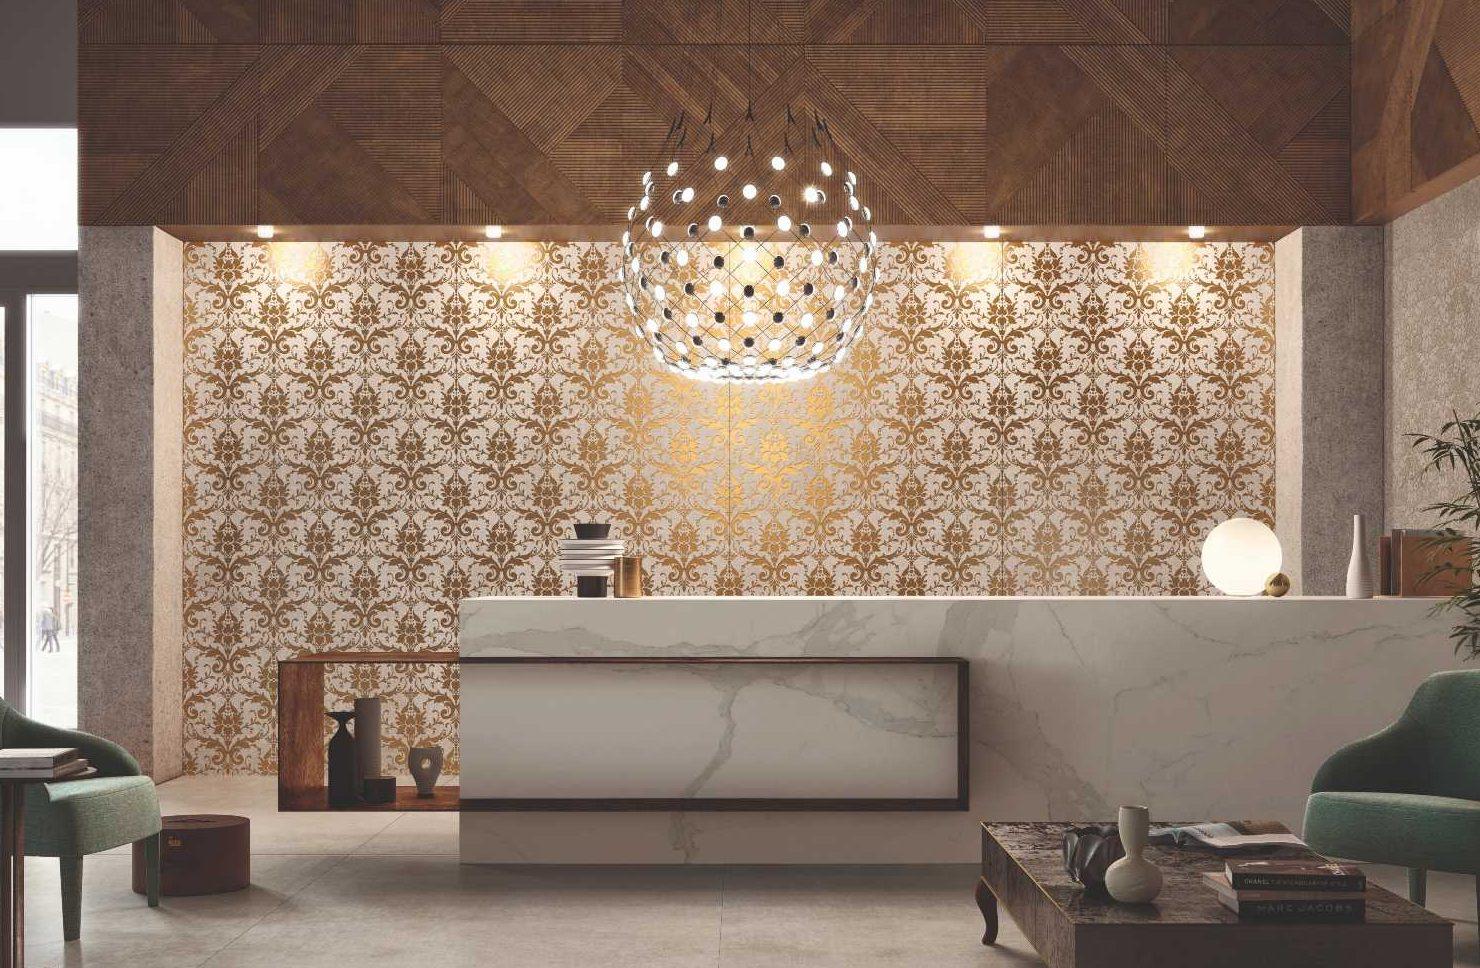 SVAI_rivestimento in kerlite oro parete cucina